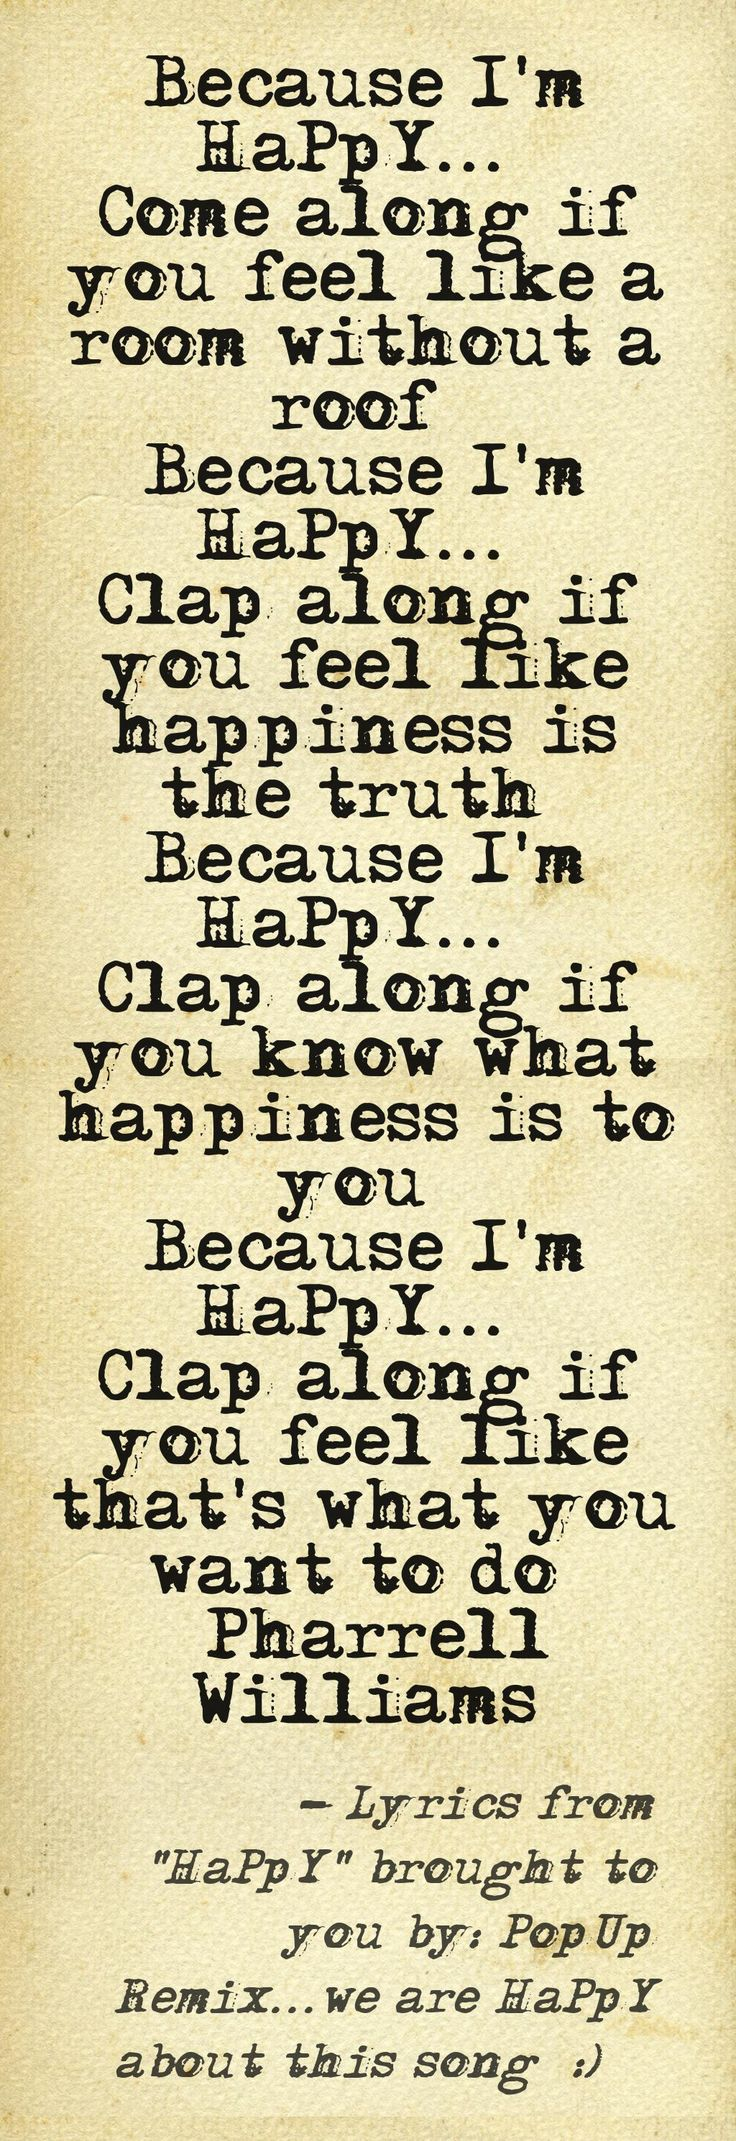 Because I'm Happy - Pharrell Williams here's ur lyrics lol @Casie D D D D D D D D D Swanner